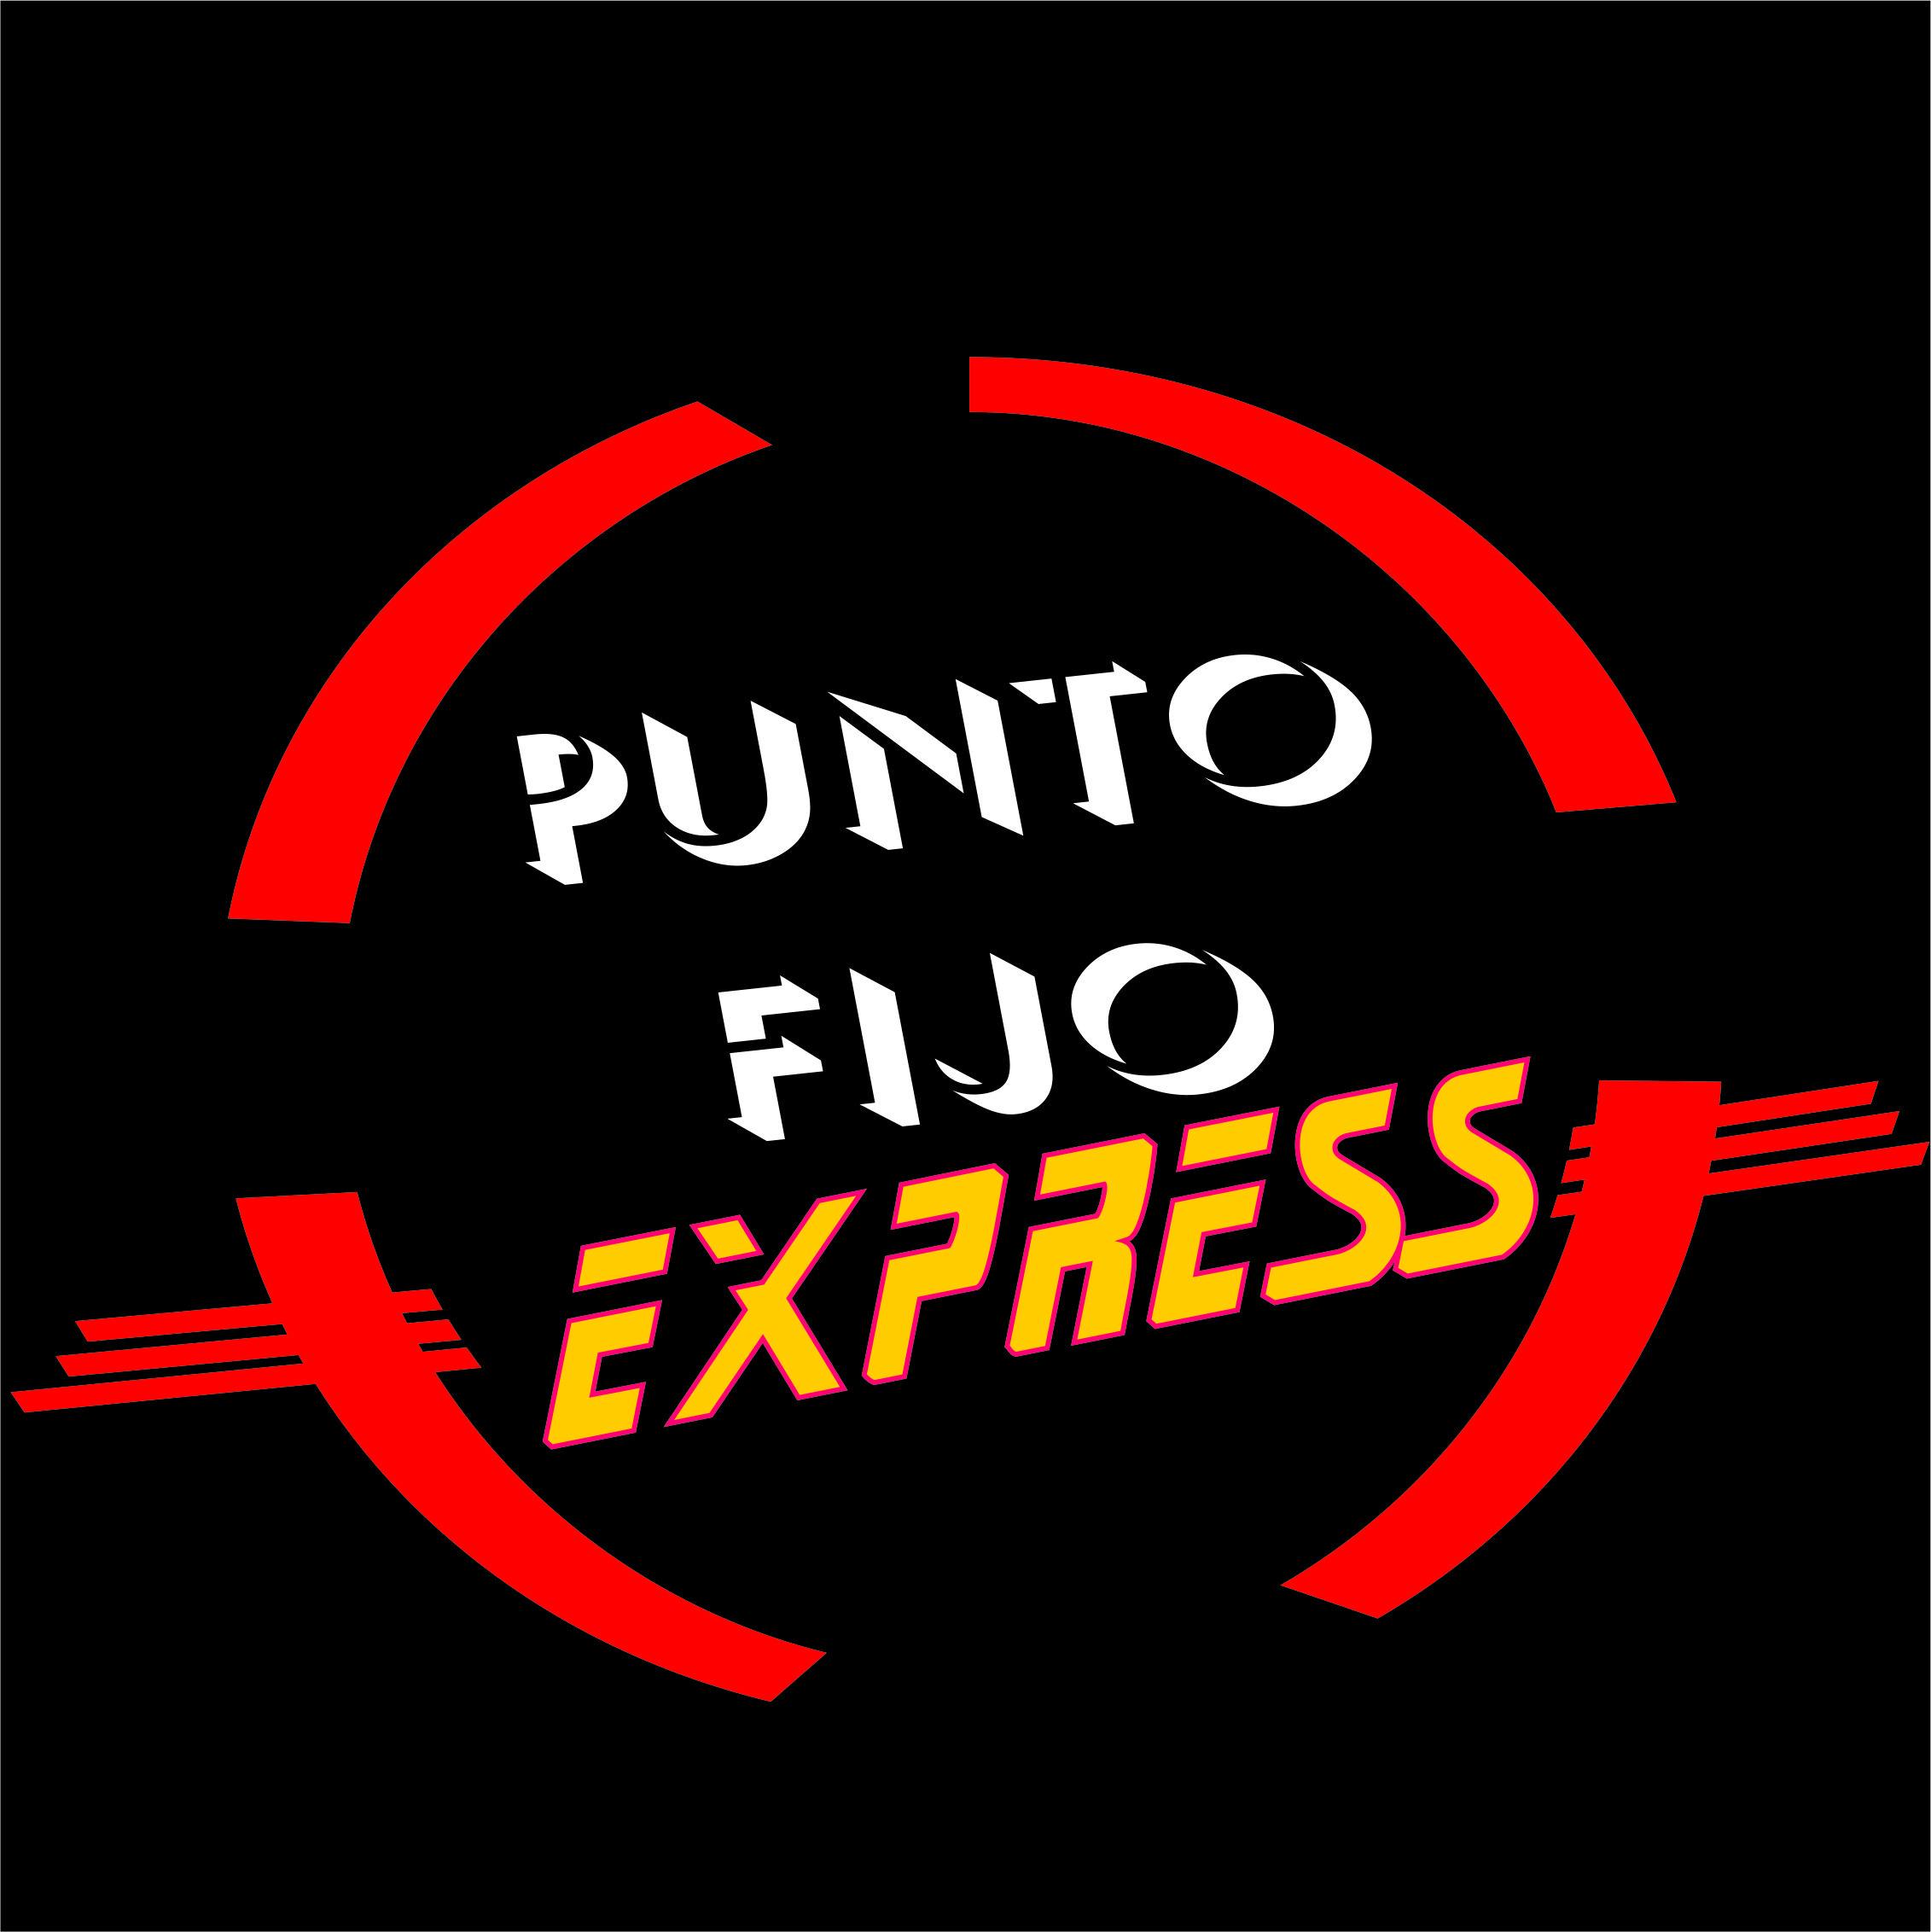 Punto Fijo Express